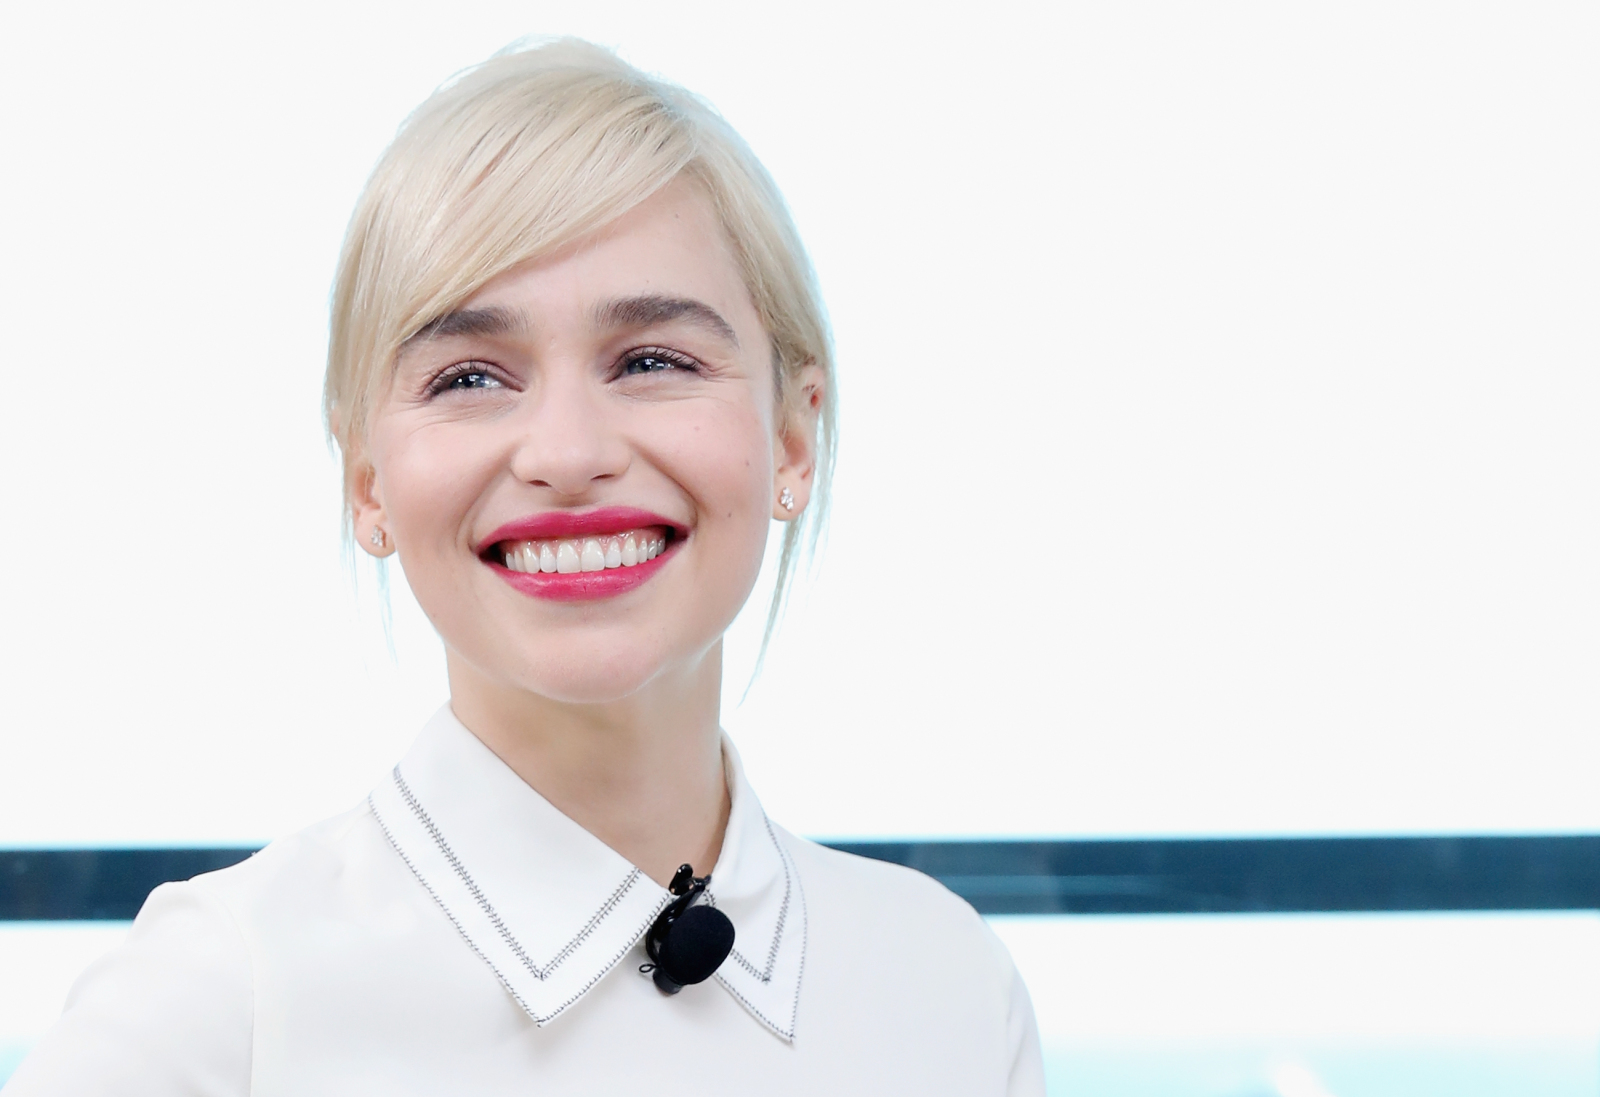 Emilia Clarke raises money for coronavirus relief, offers virtual dinner with herself